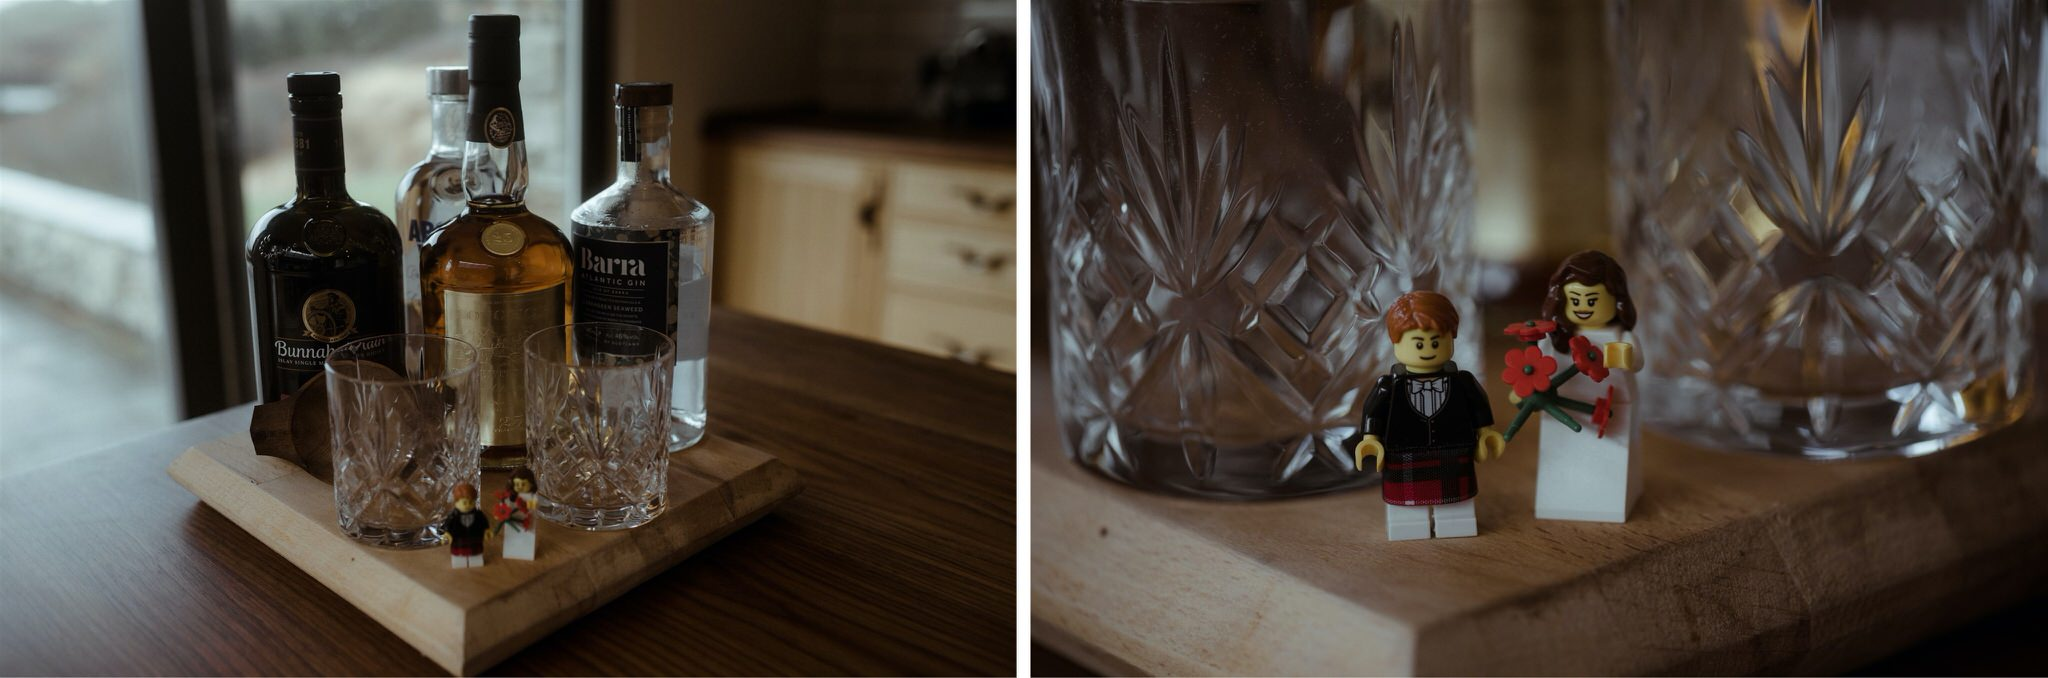 Bottles of single malt whisky at a Scottish elopement